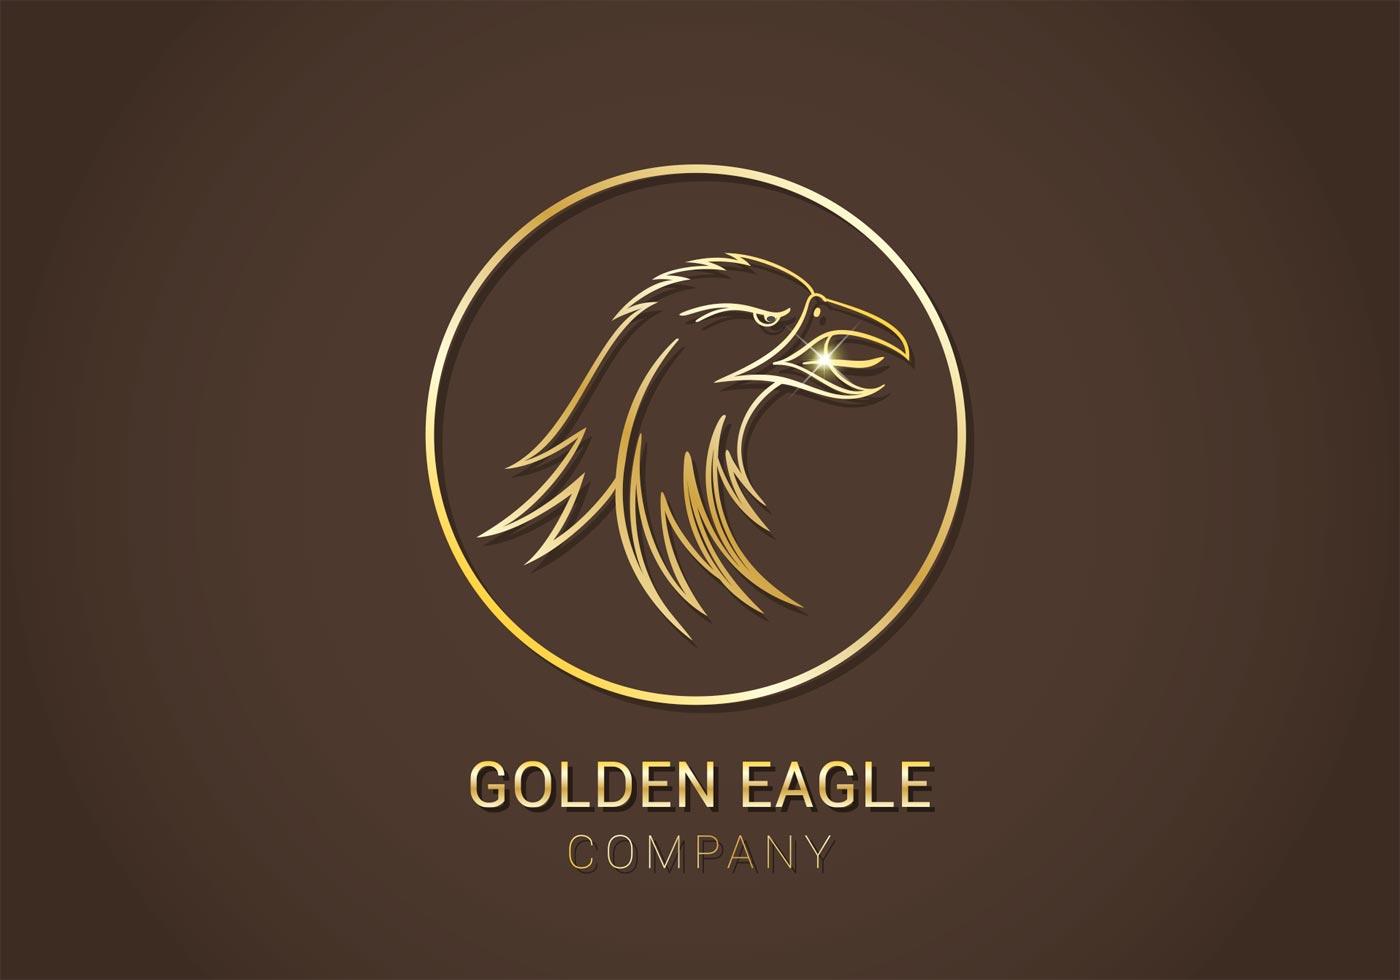 golden eagle vector logo download free vector art stock